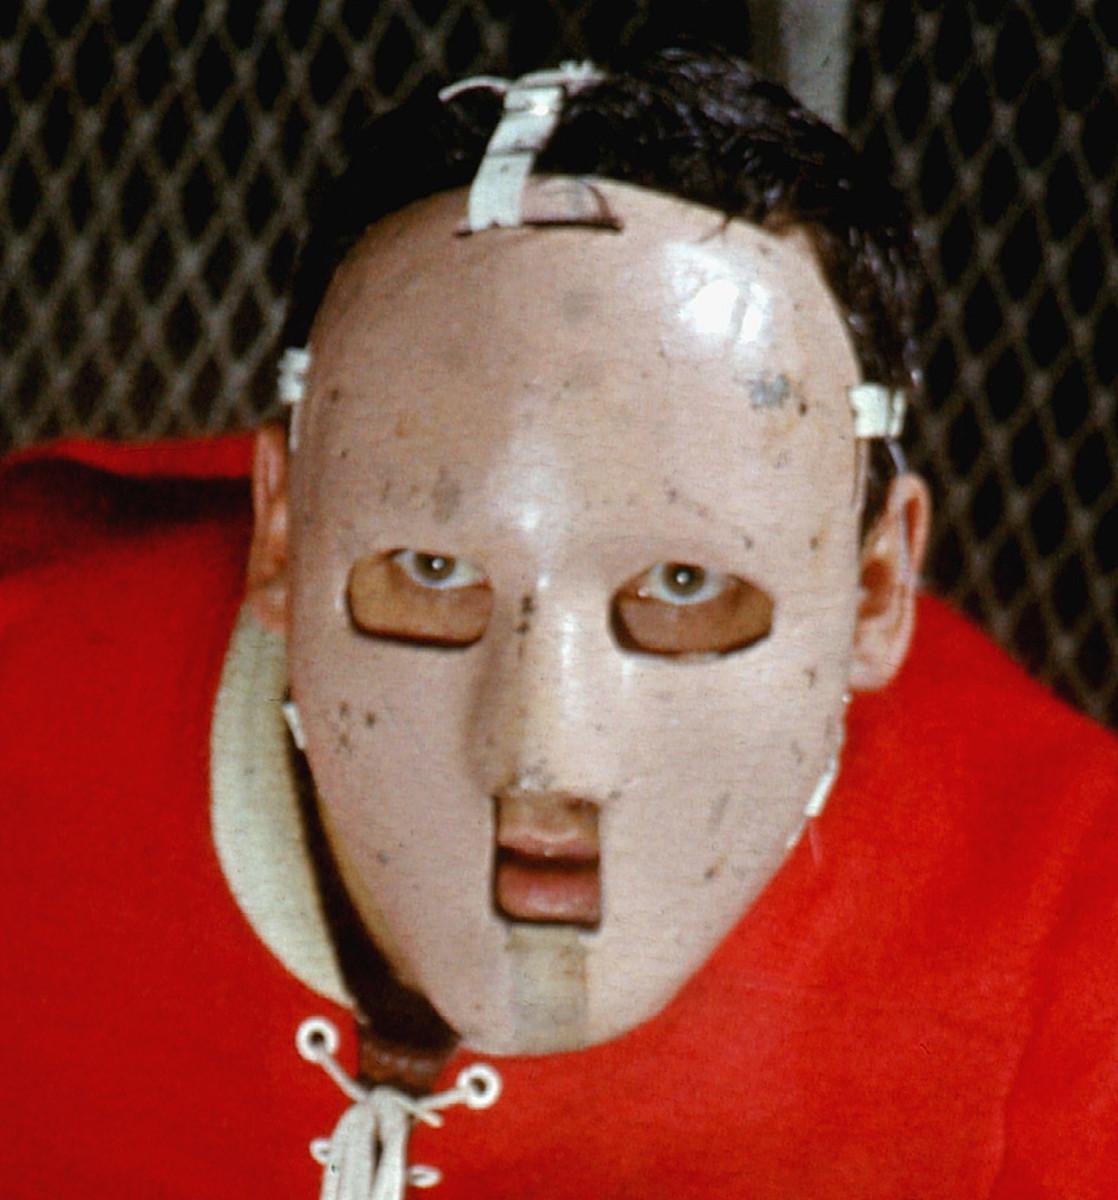 1959-Jacque-Plante-goalie-mask.jpg